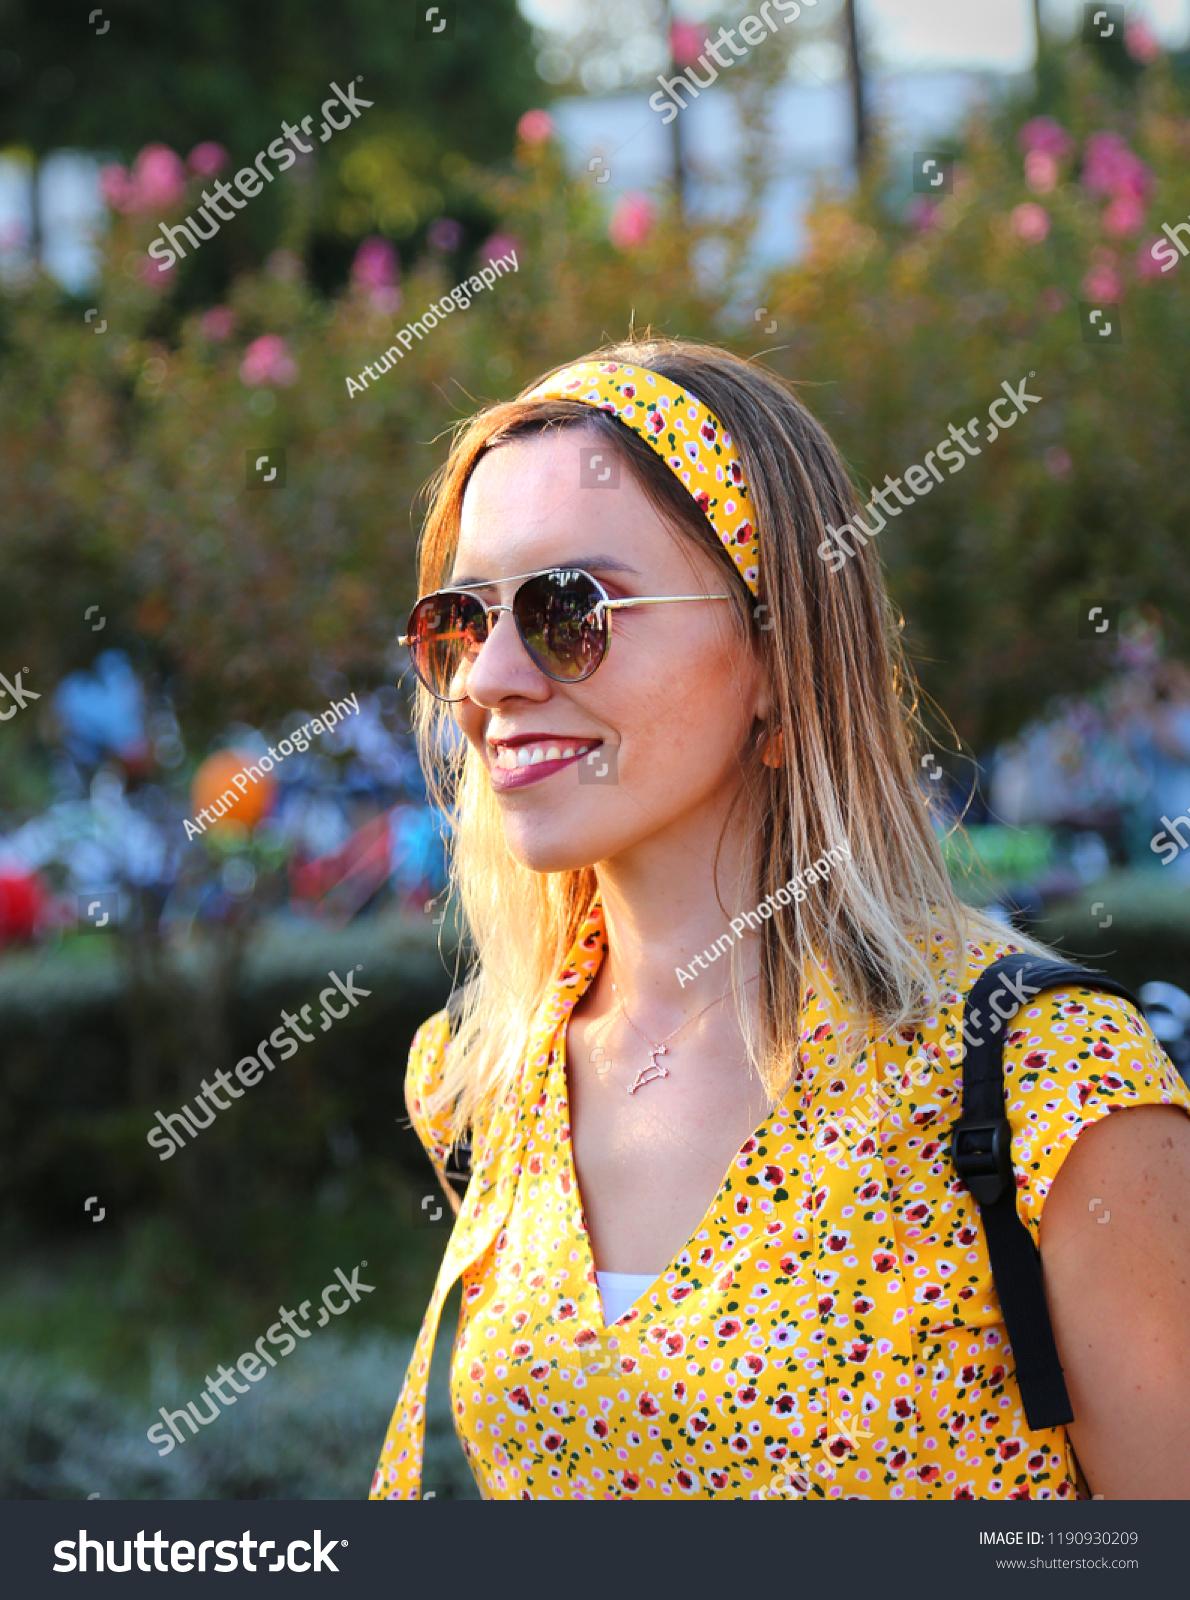 09232018 Konak Izmir Girl Smiling Yellow Stock Photo Edit Now 1190930209